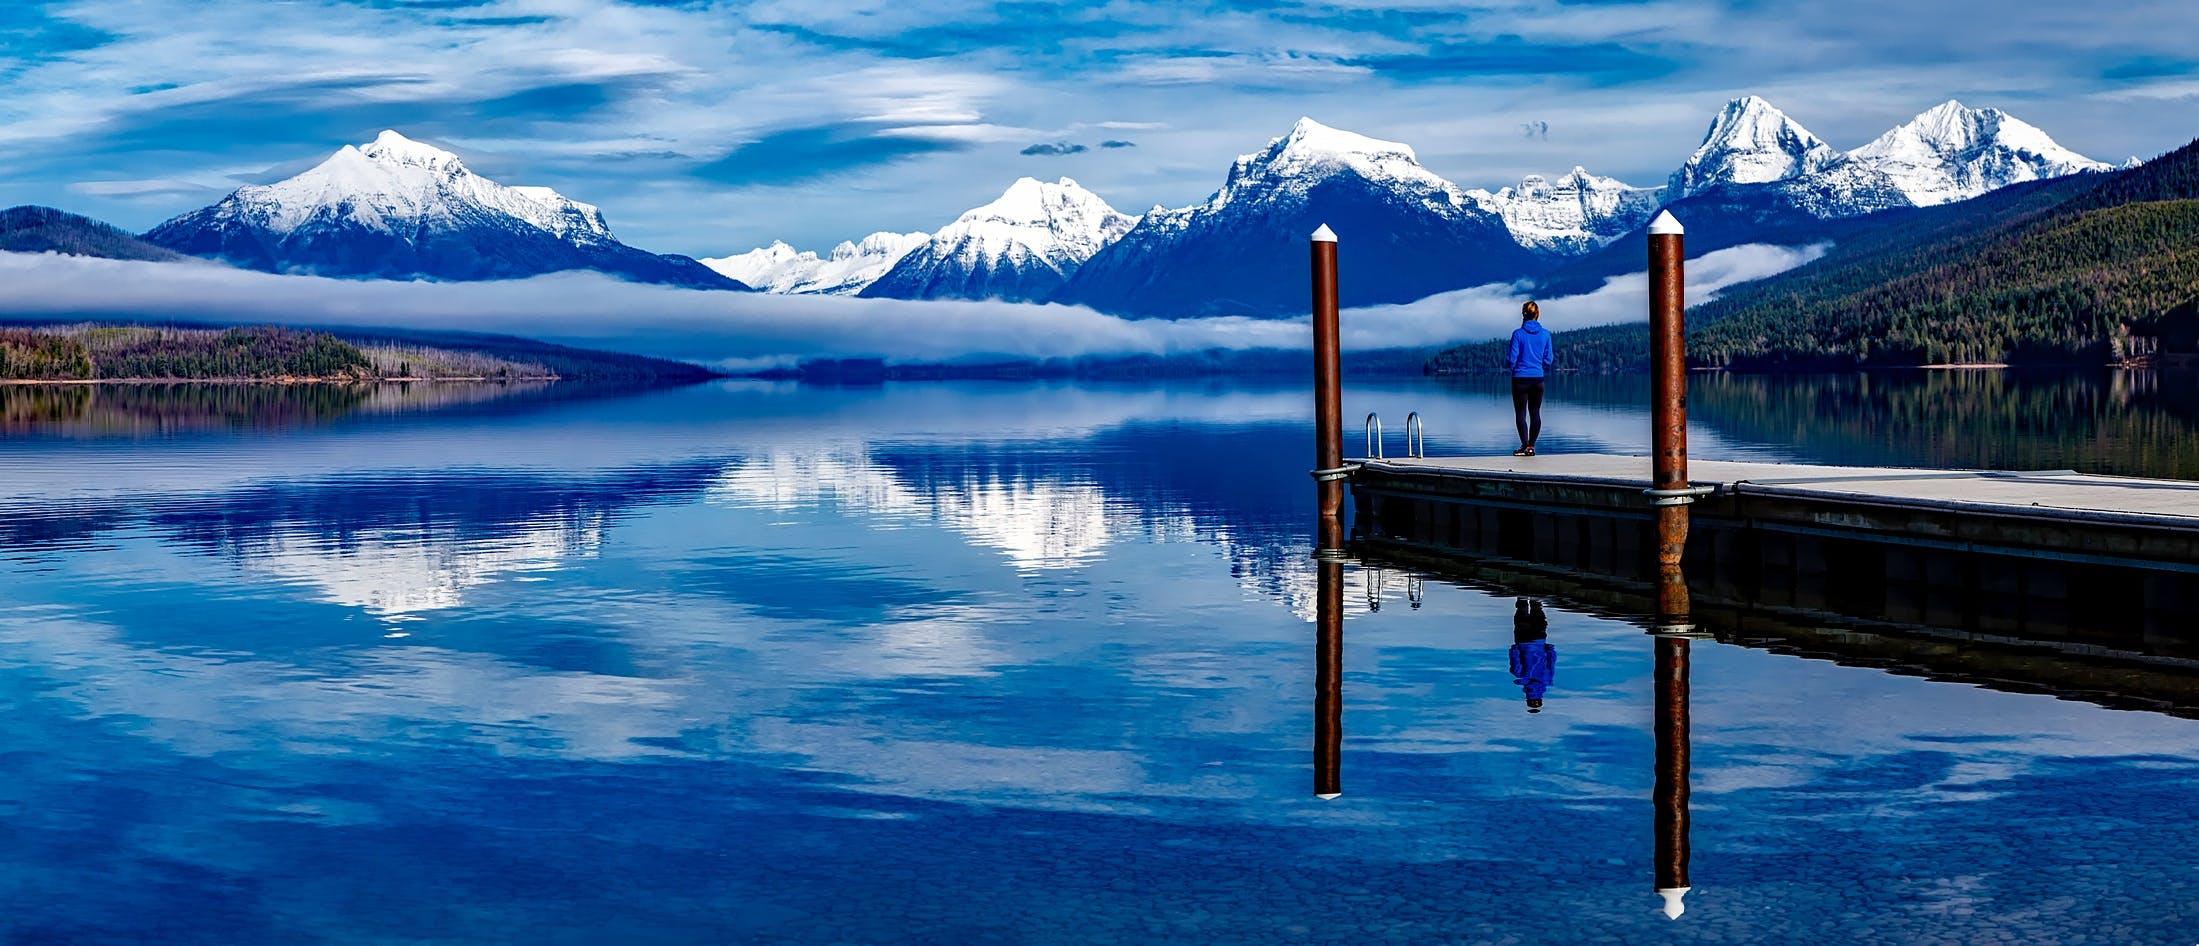 Kostenloses Stock Foto zu abenteuer, alpen, berge, dock